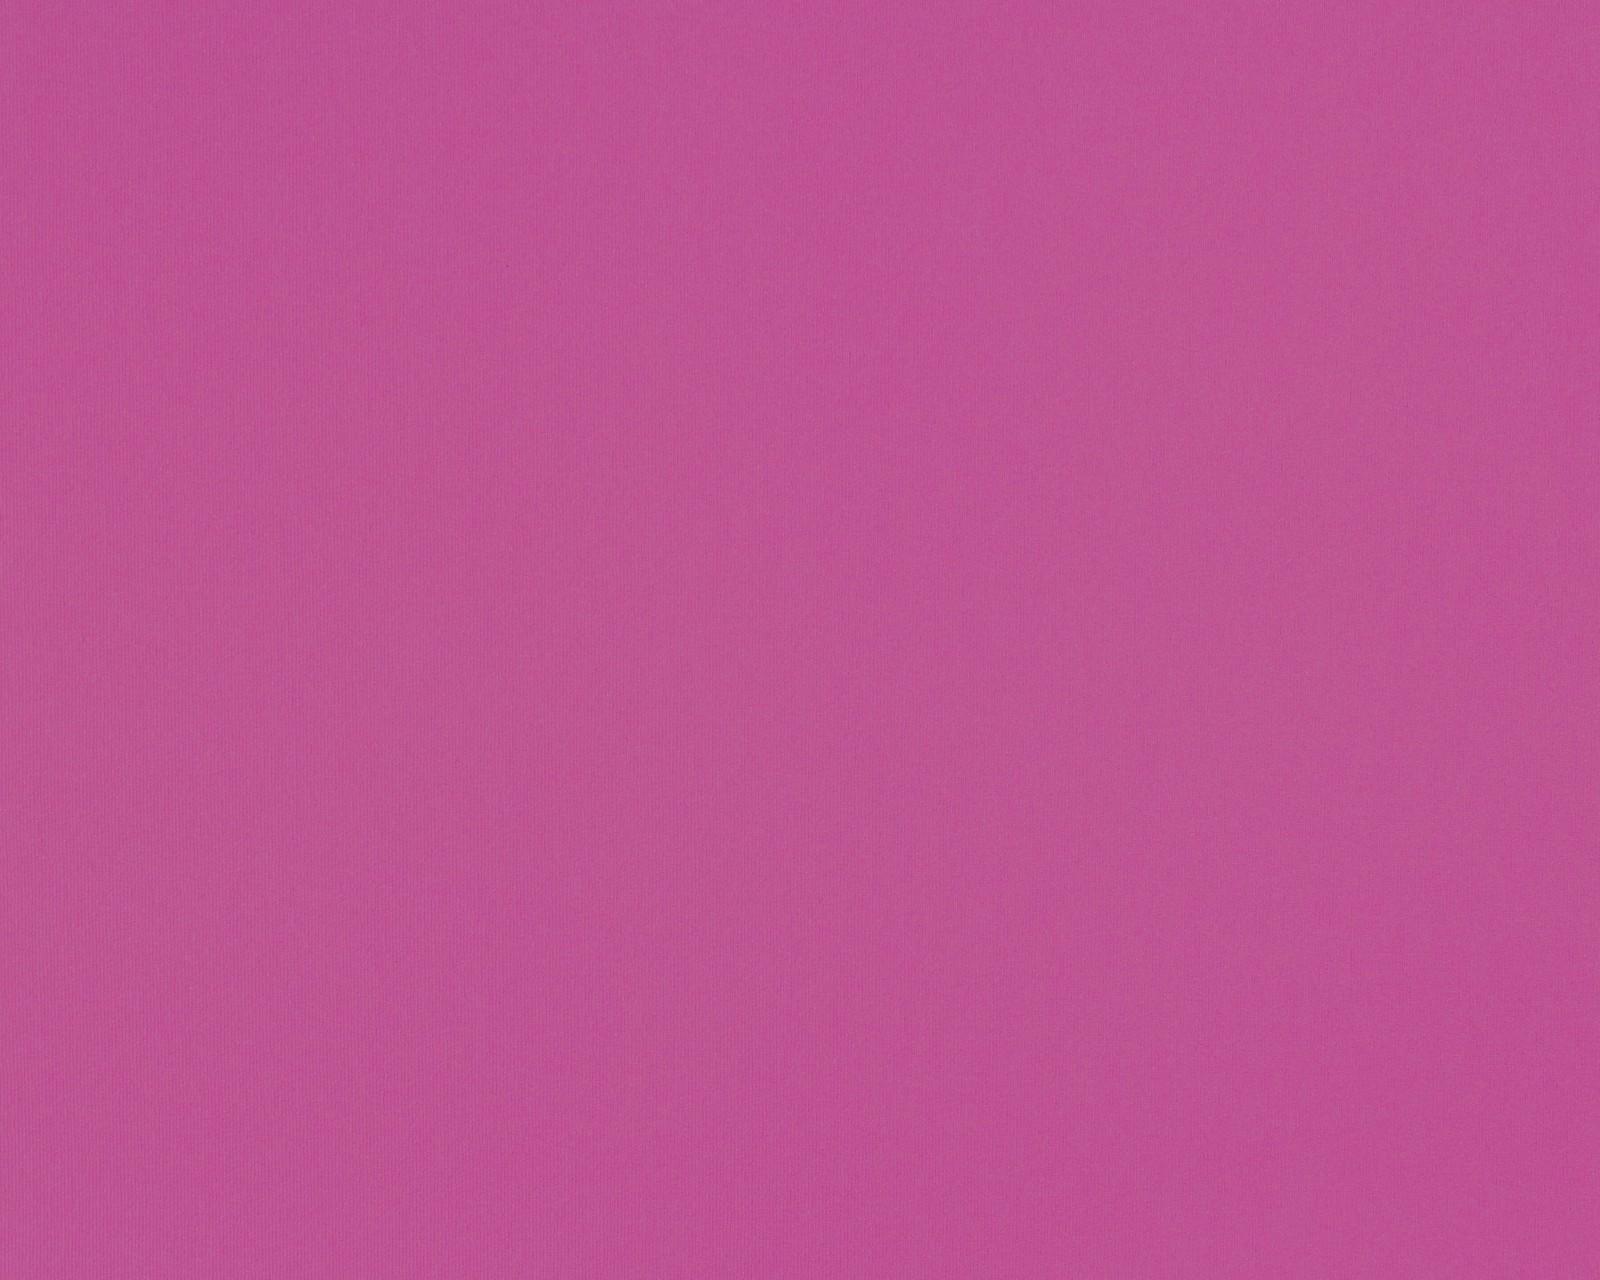 vliestapete esprit home uni pink 94148 6. Black Bedroom Furniture Sets. Home Design Ideas